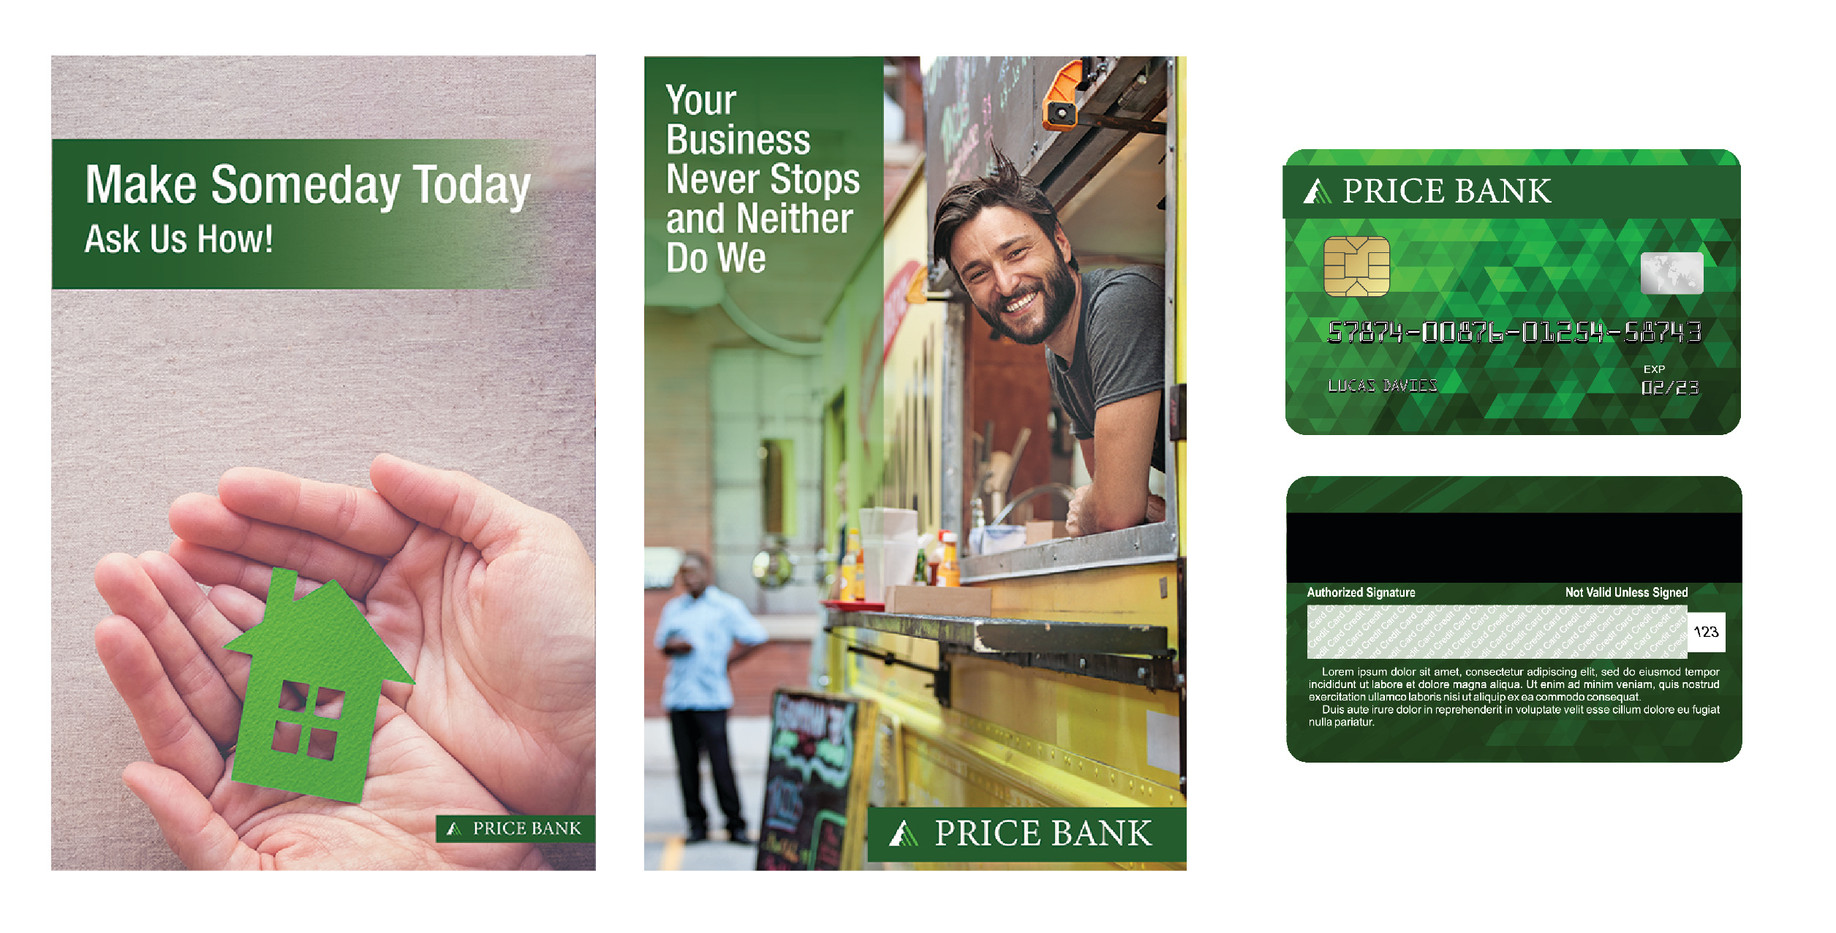 Price Bank